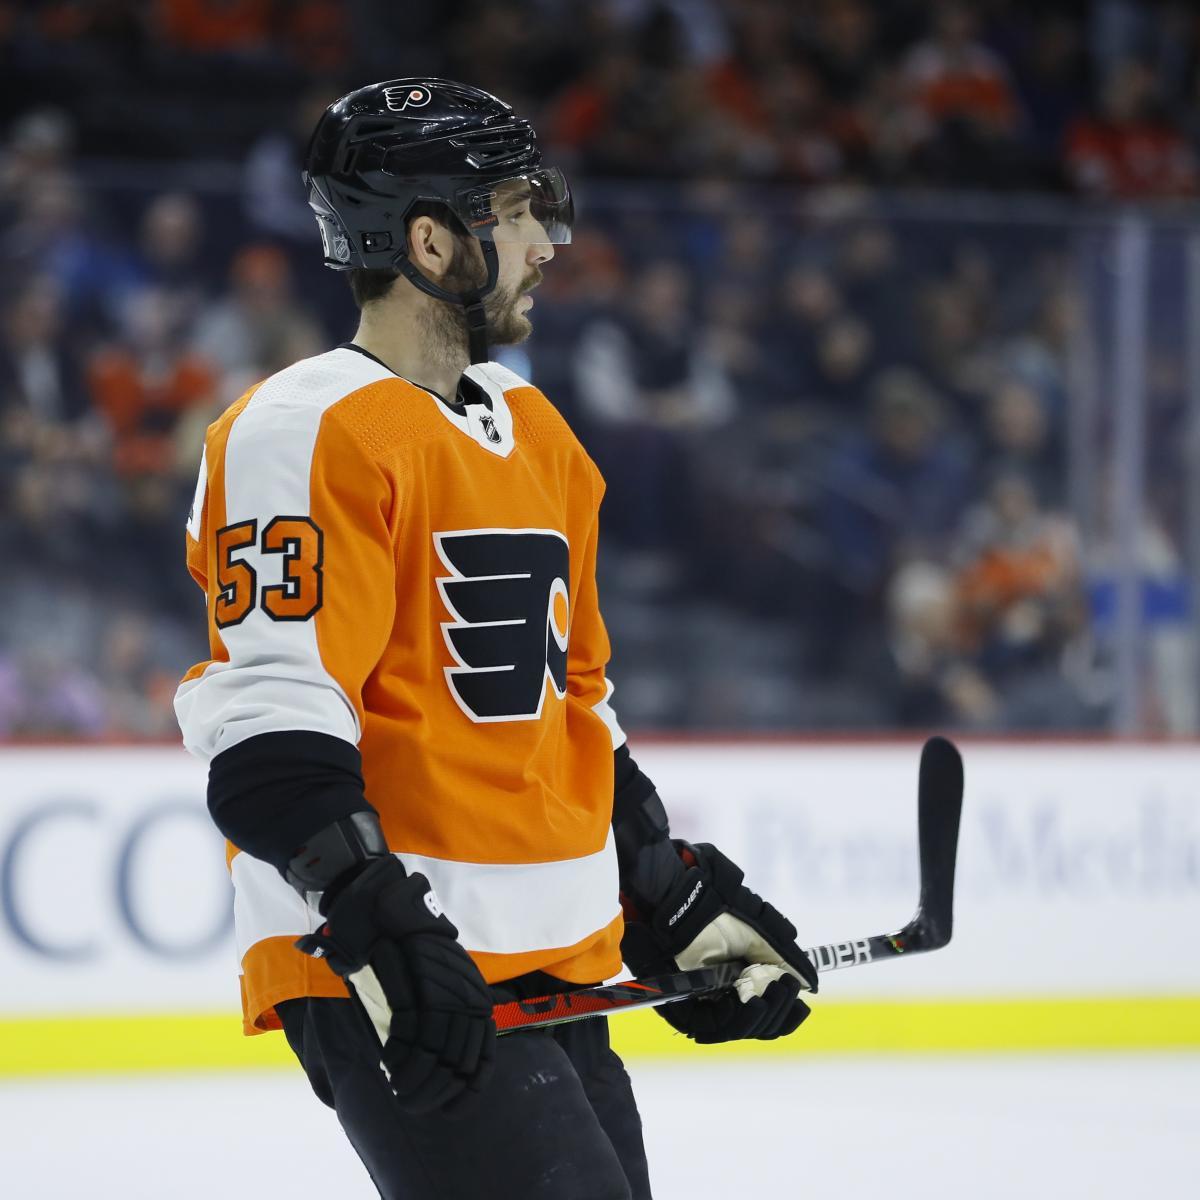 NHL Trade Rumors: Latest Buzz on Shayne Gostisbehere, Flyers, Sharks